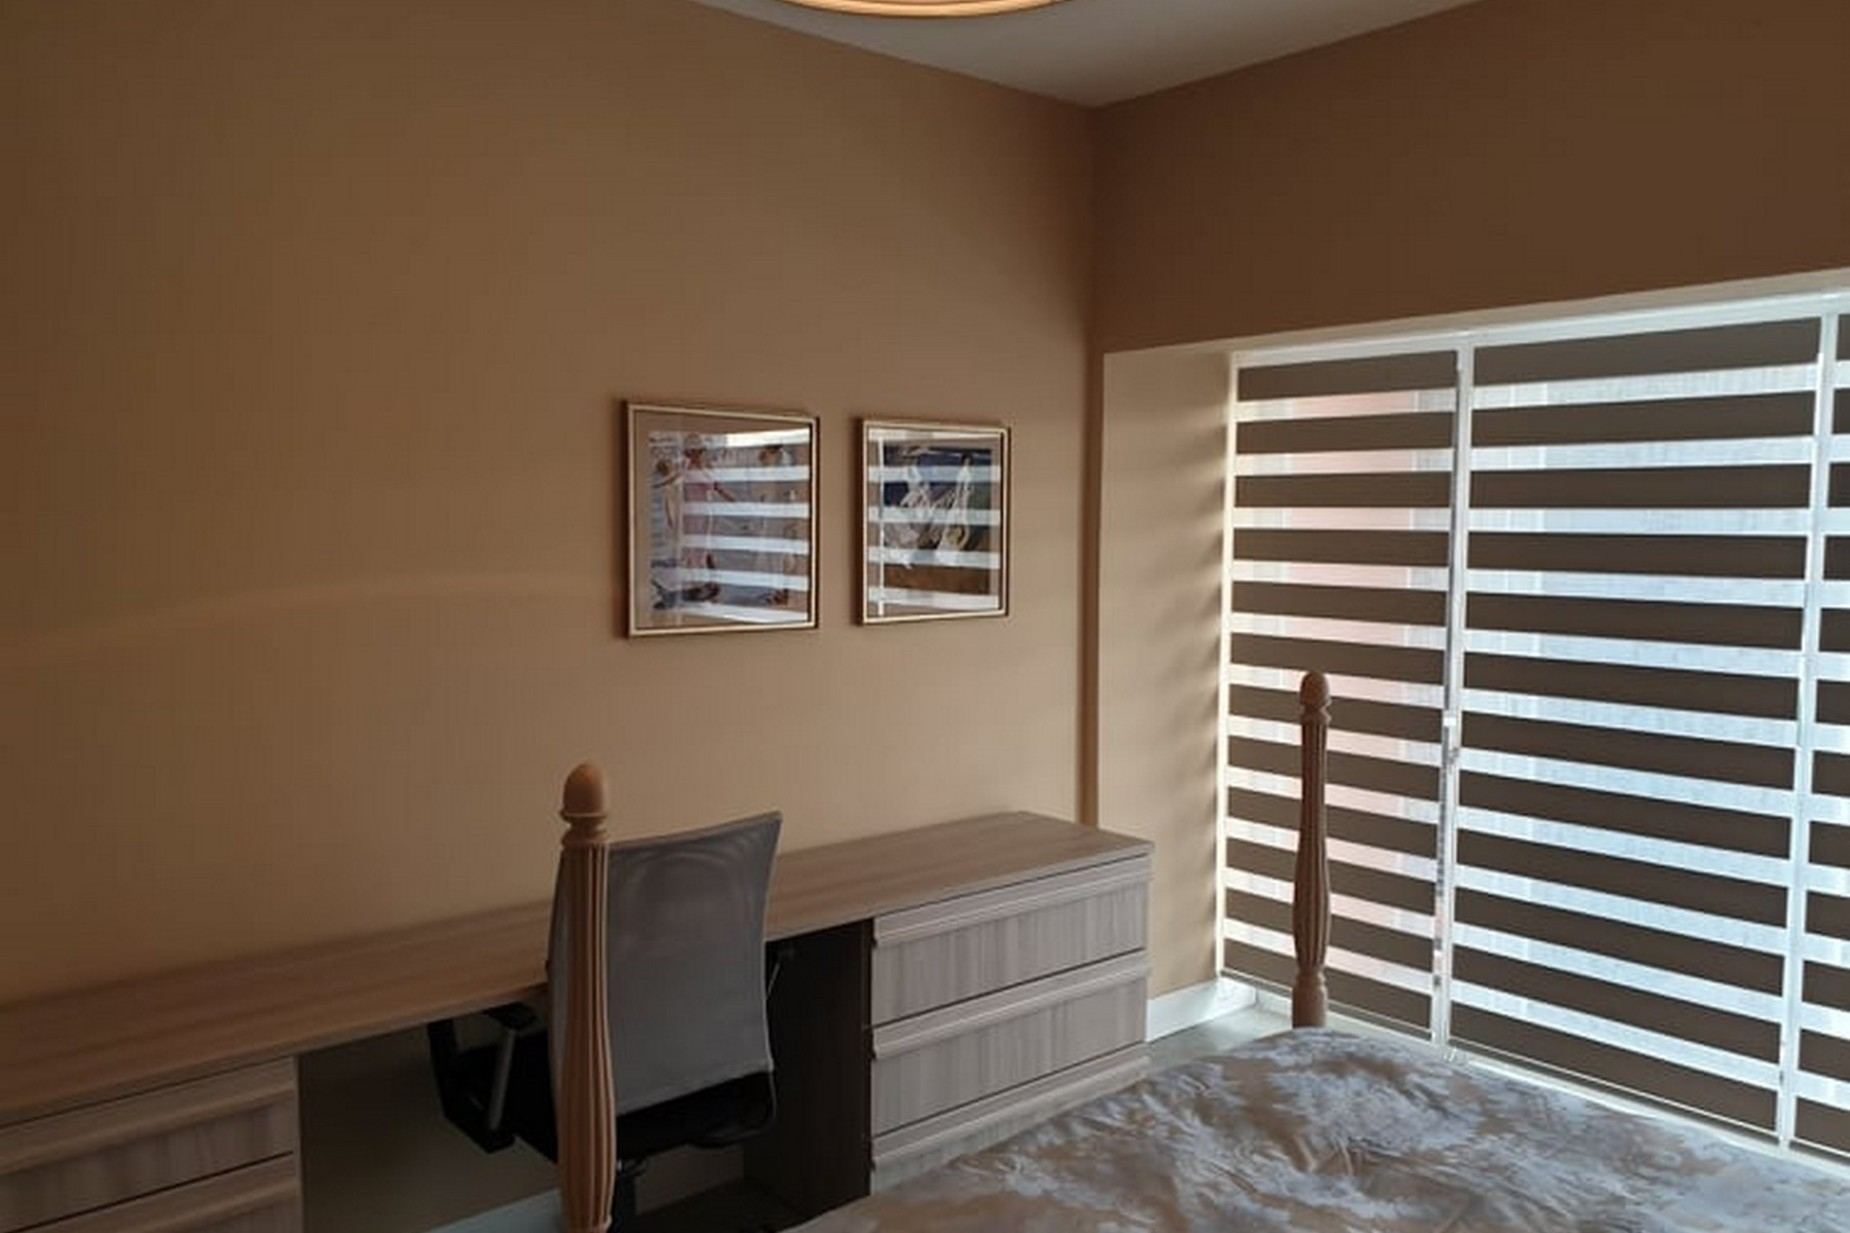 3 bed Apartment For Rent in Birkirkara, Birkirkara - thumb 18